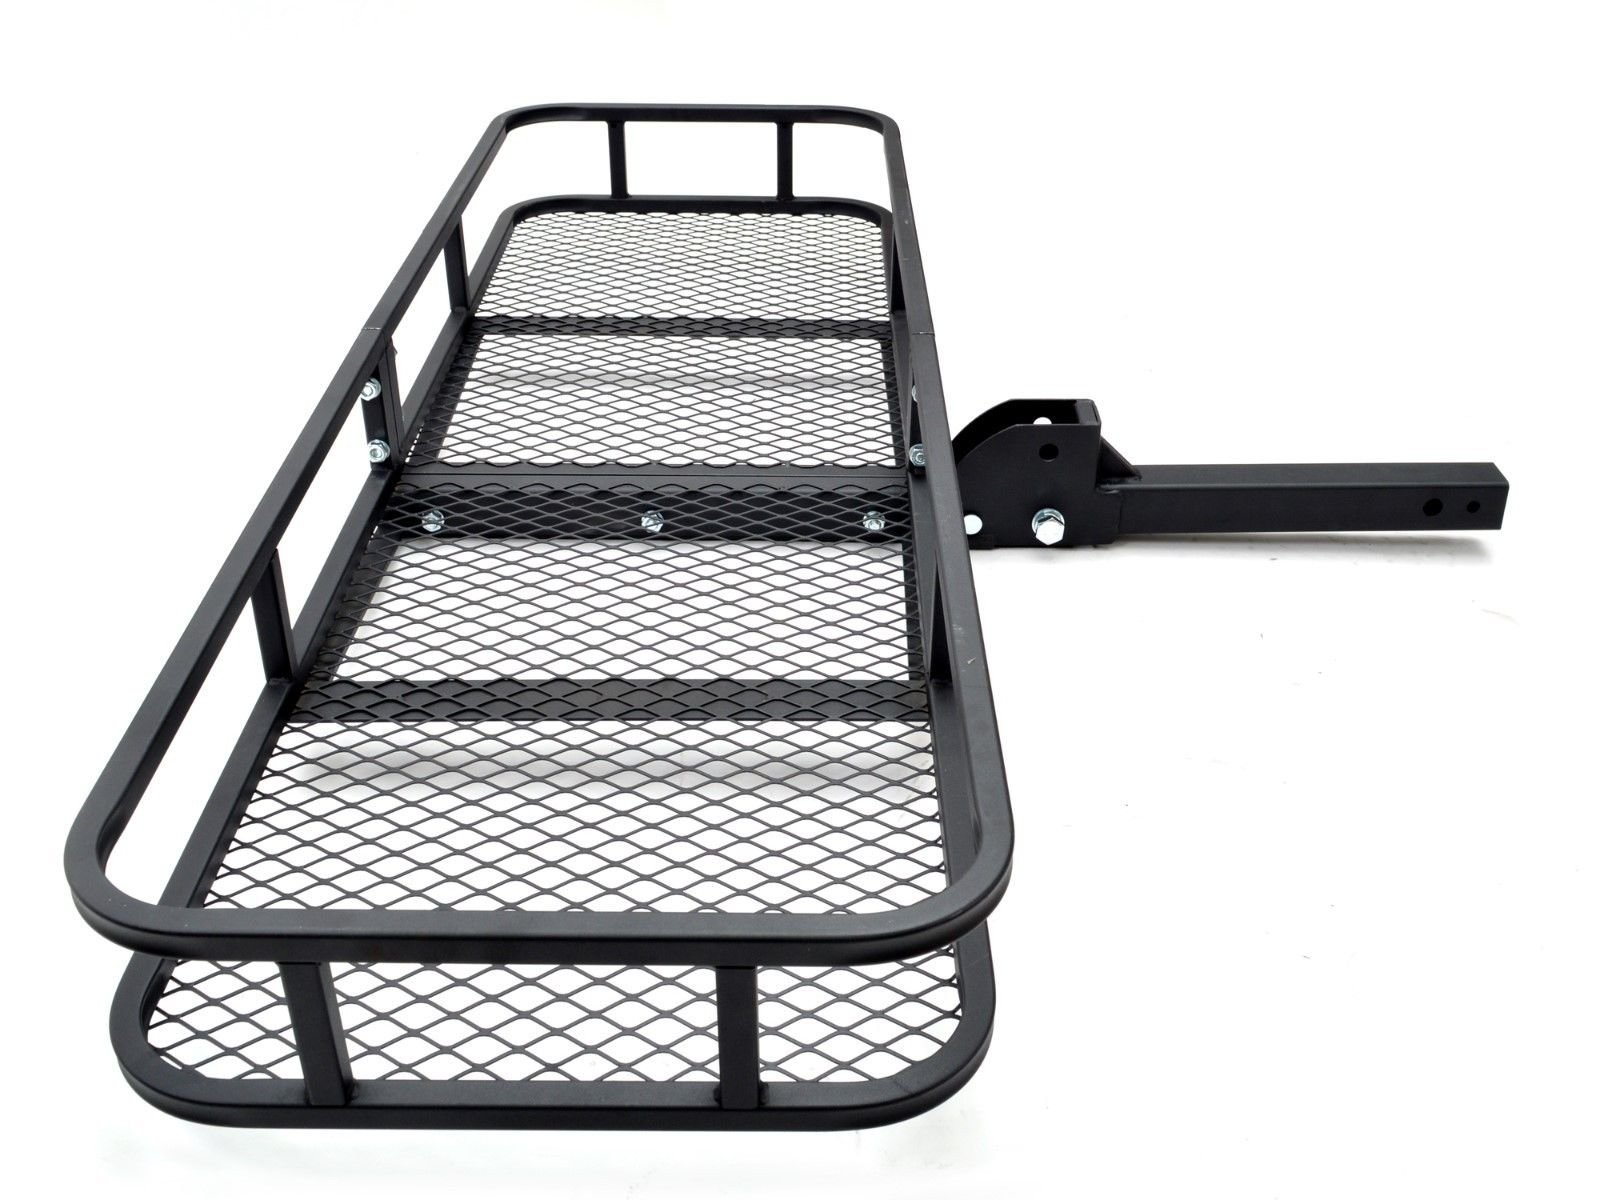 Thegood88 Folding Cargo Carrier Basket Luggage Rack Hauler Truck Car Hitch 2'' Receiver TG0346